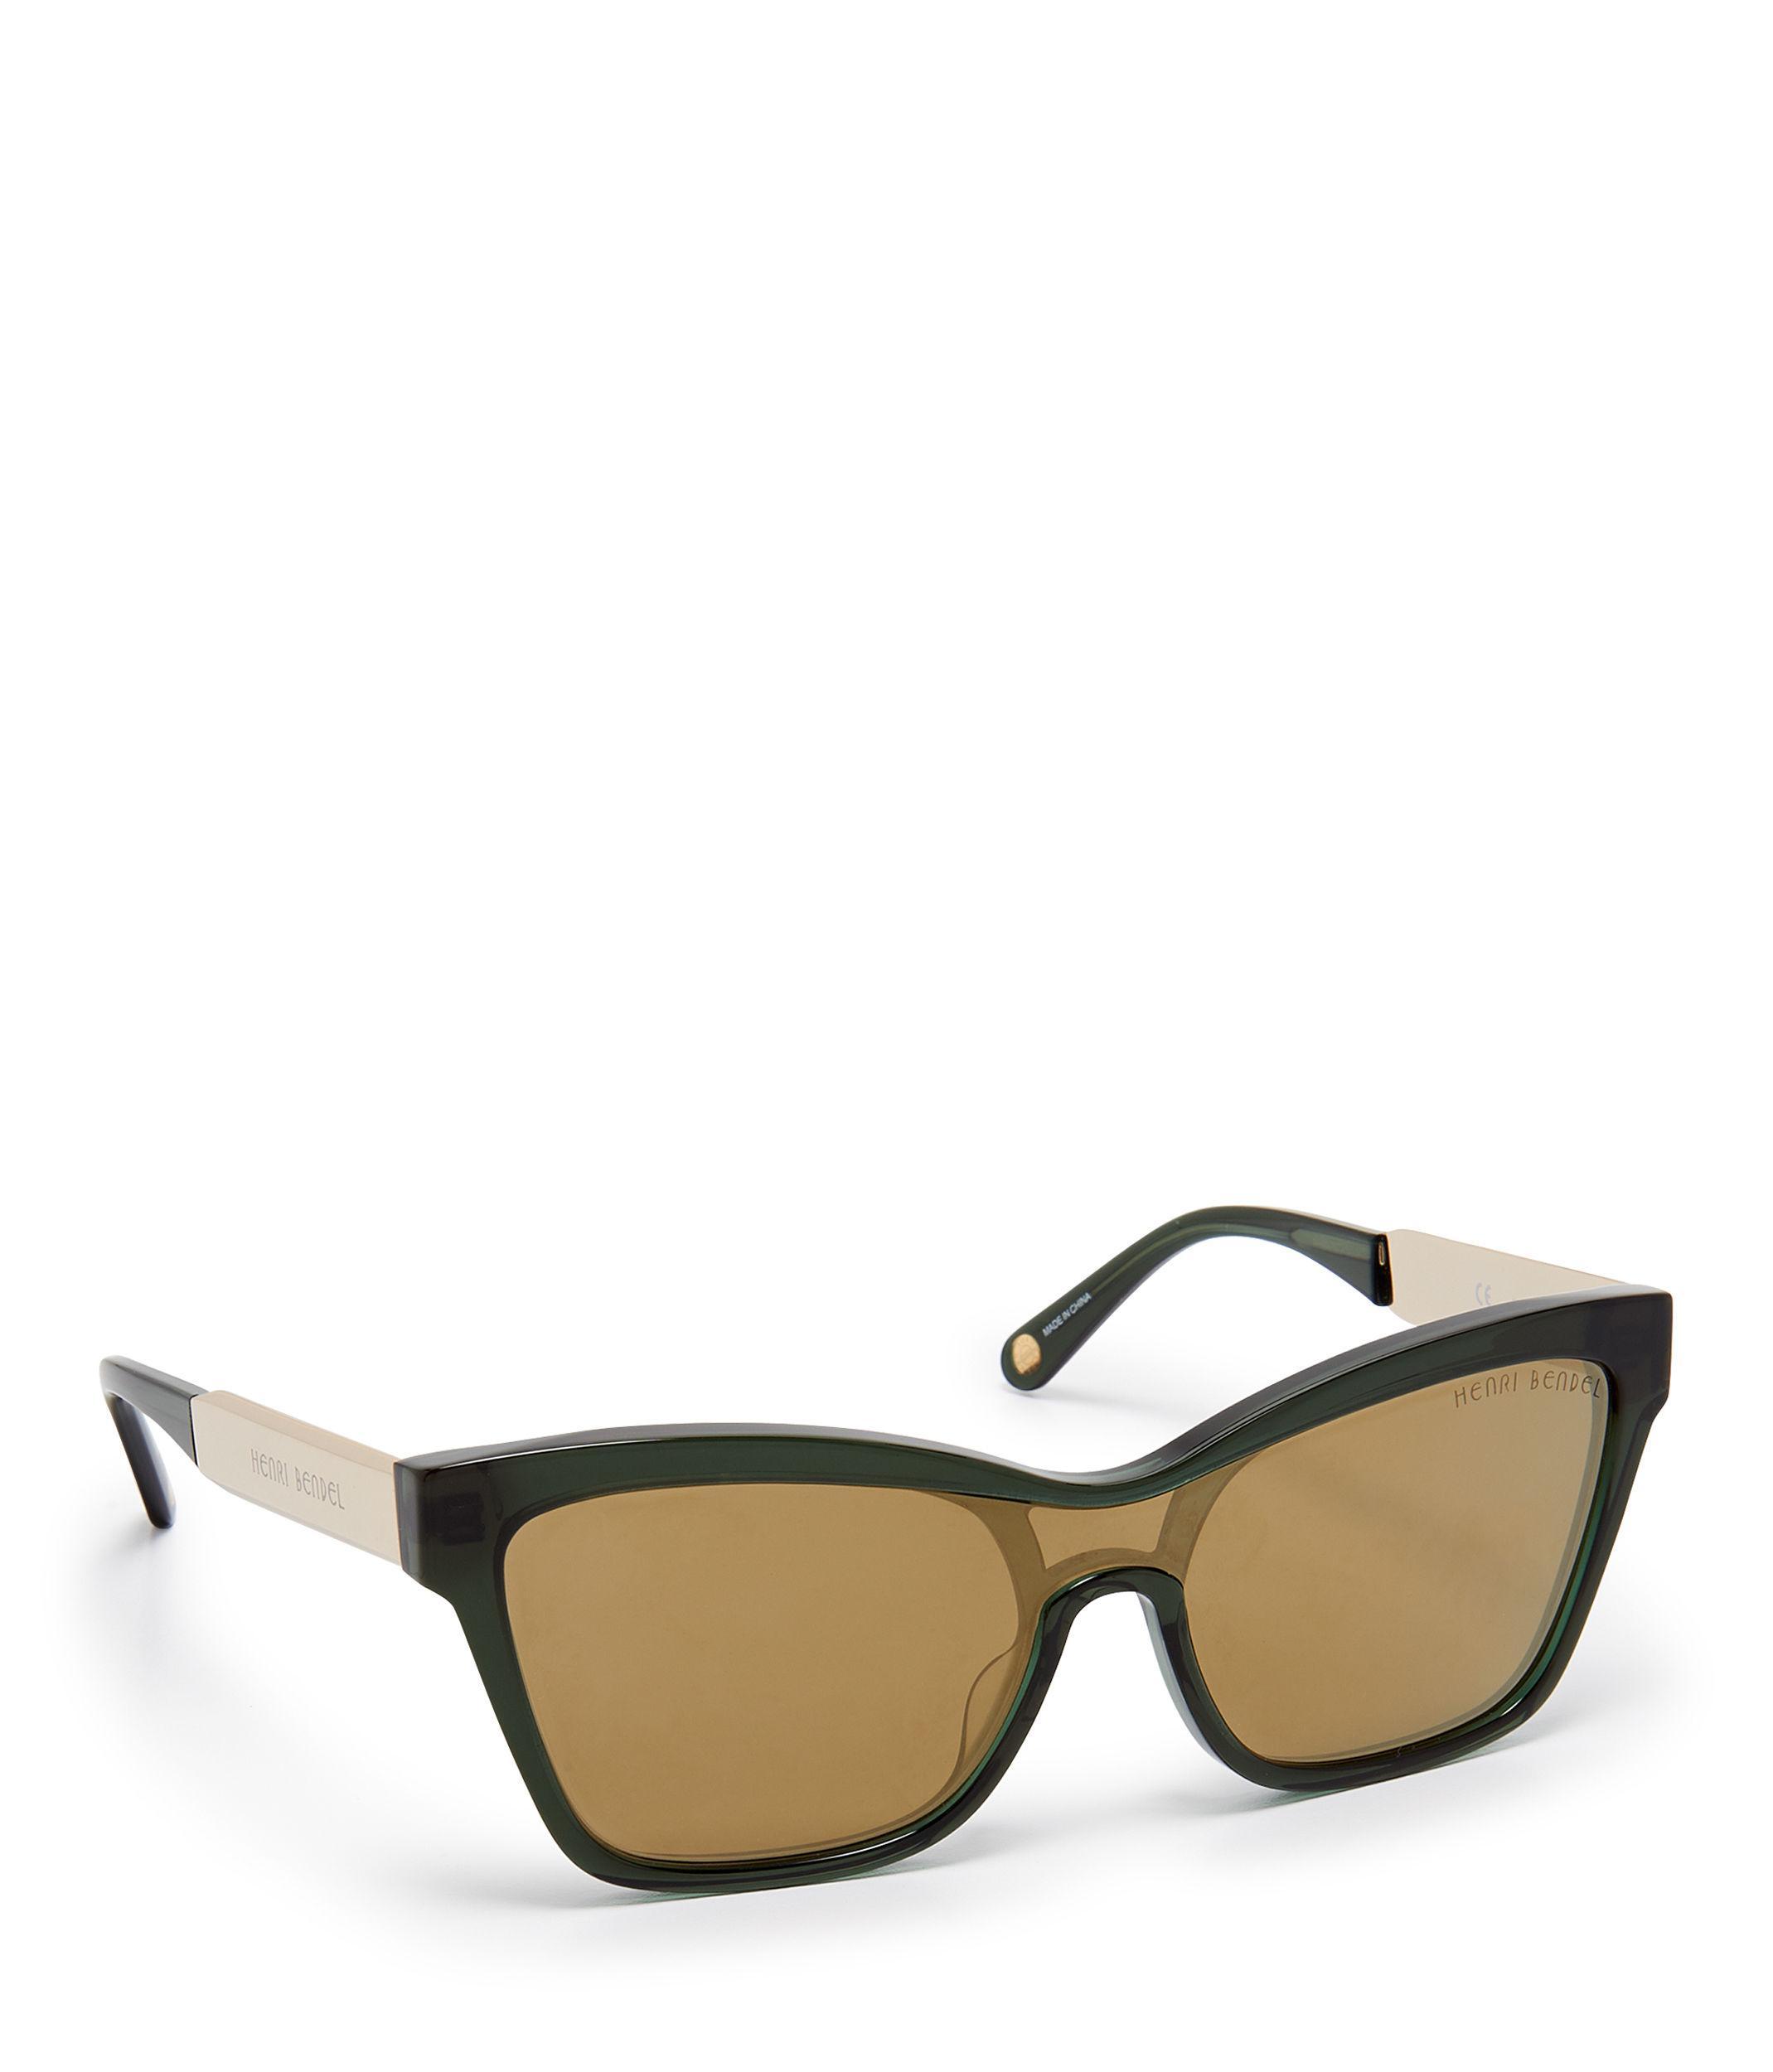 66219efb7f Henri Bendel - Green Elena Square Sunglasses - Lyst. View fullscreen